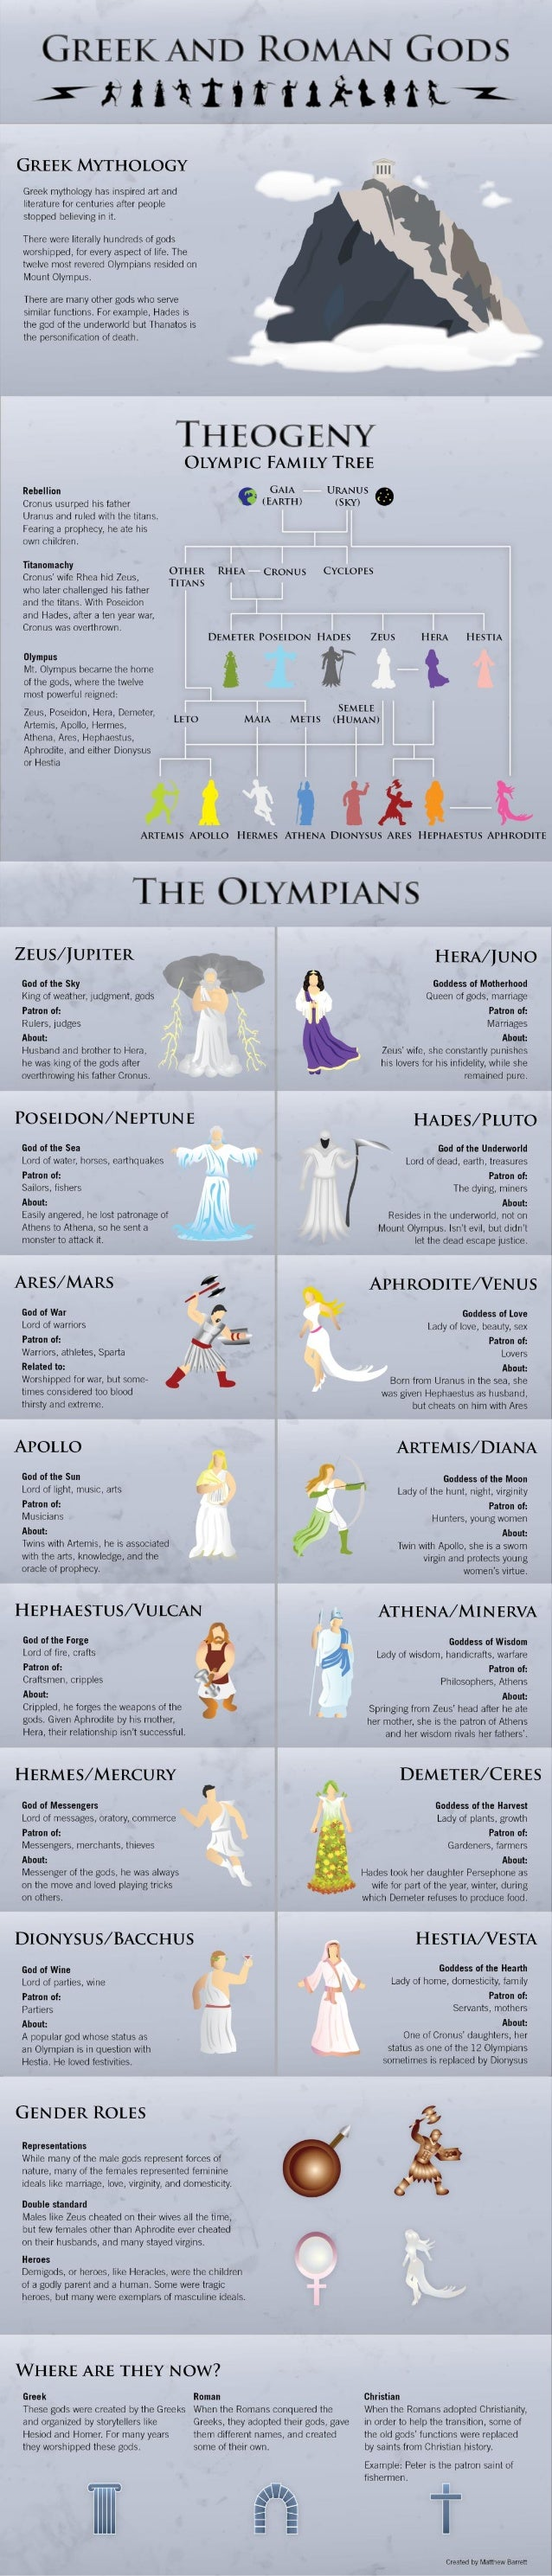 "GREEKAND ROMAN GODS A'JrH""lt1'tt'1"". t)'t-HtLfi'~  GREEK MYTHOLOGY  Greek mythology has inspired art and literature for cen..."